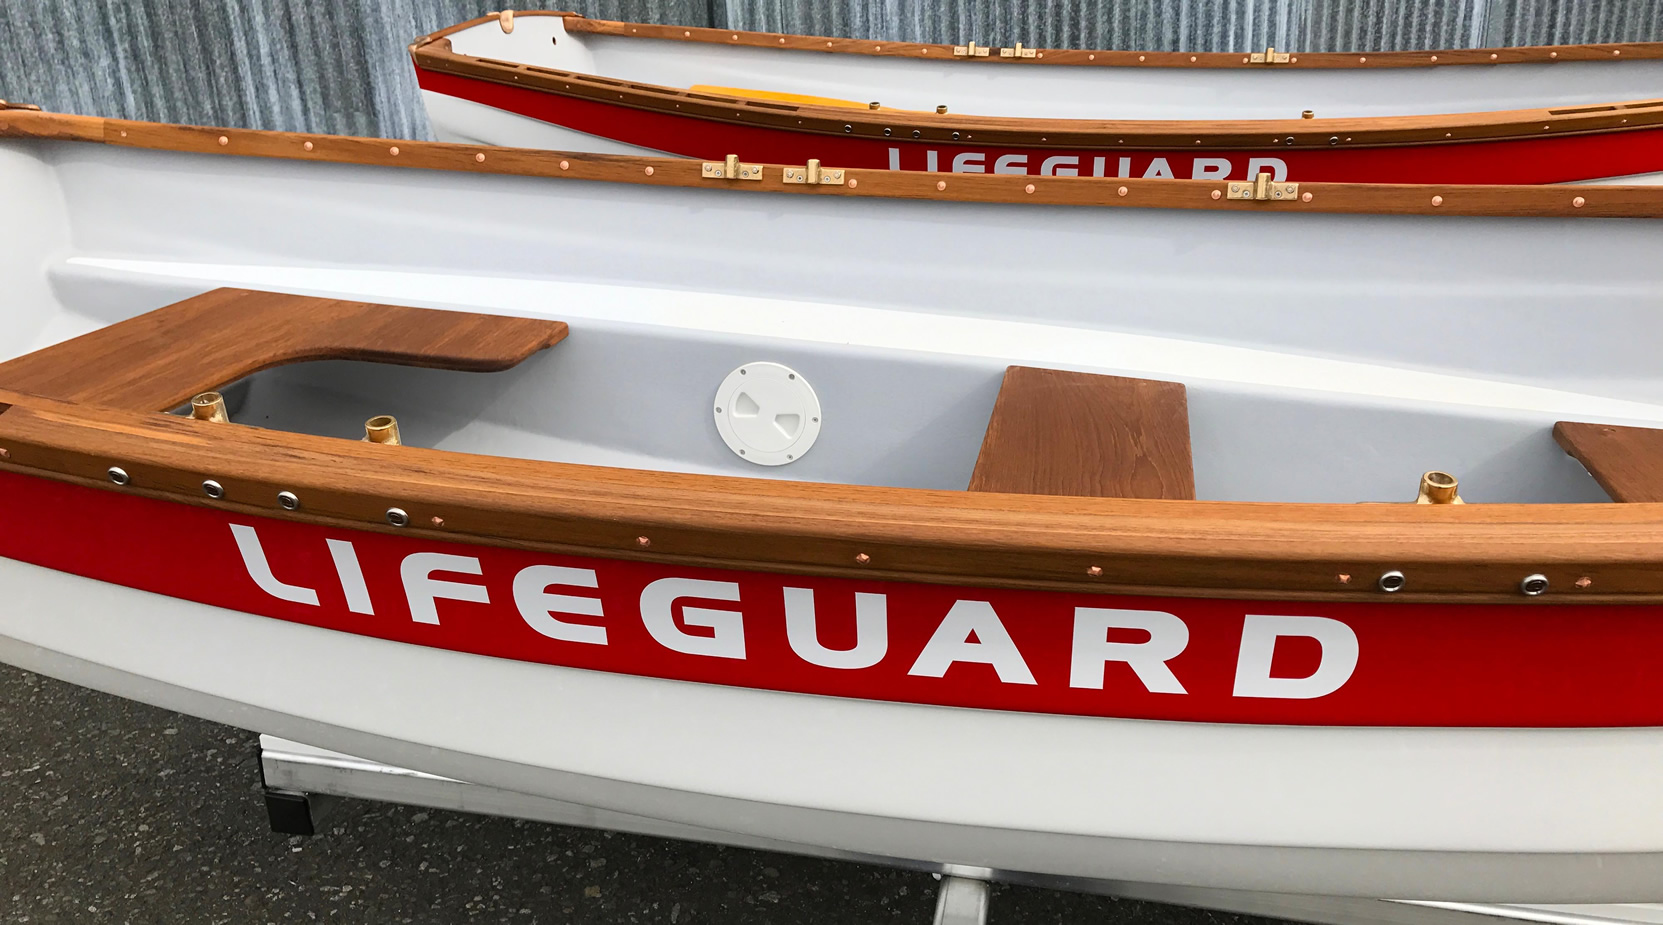 Westcoast 11.6 – Lifeguard Patrol Boat